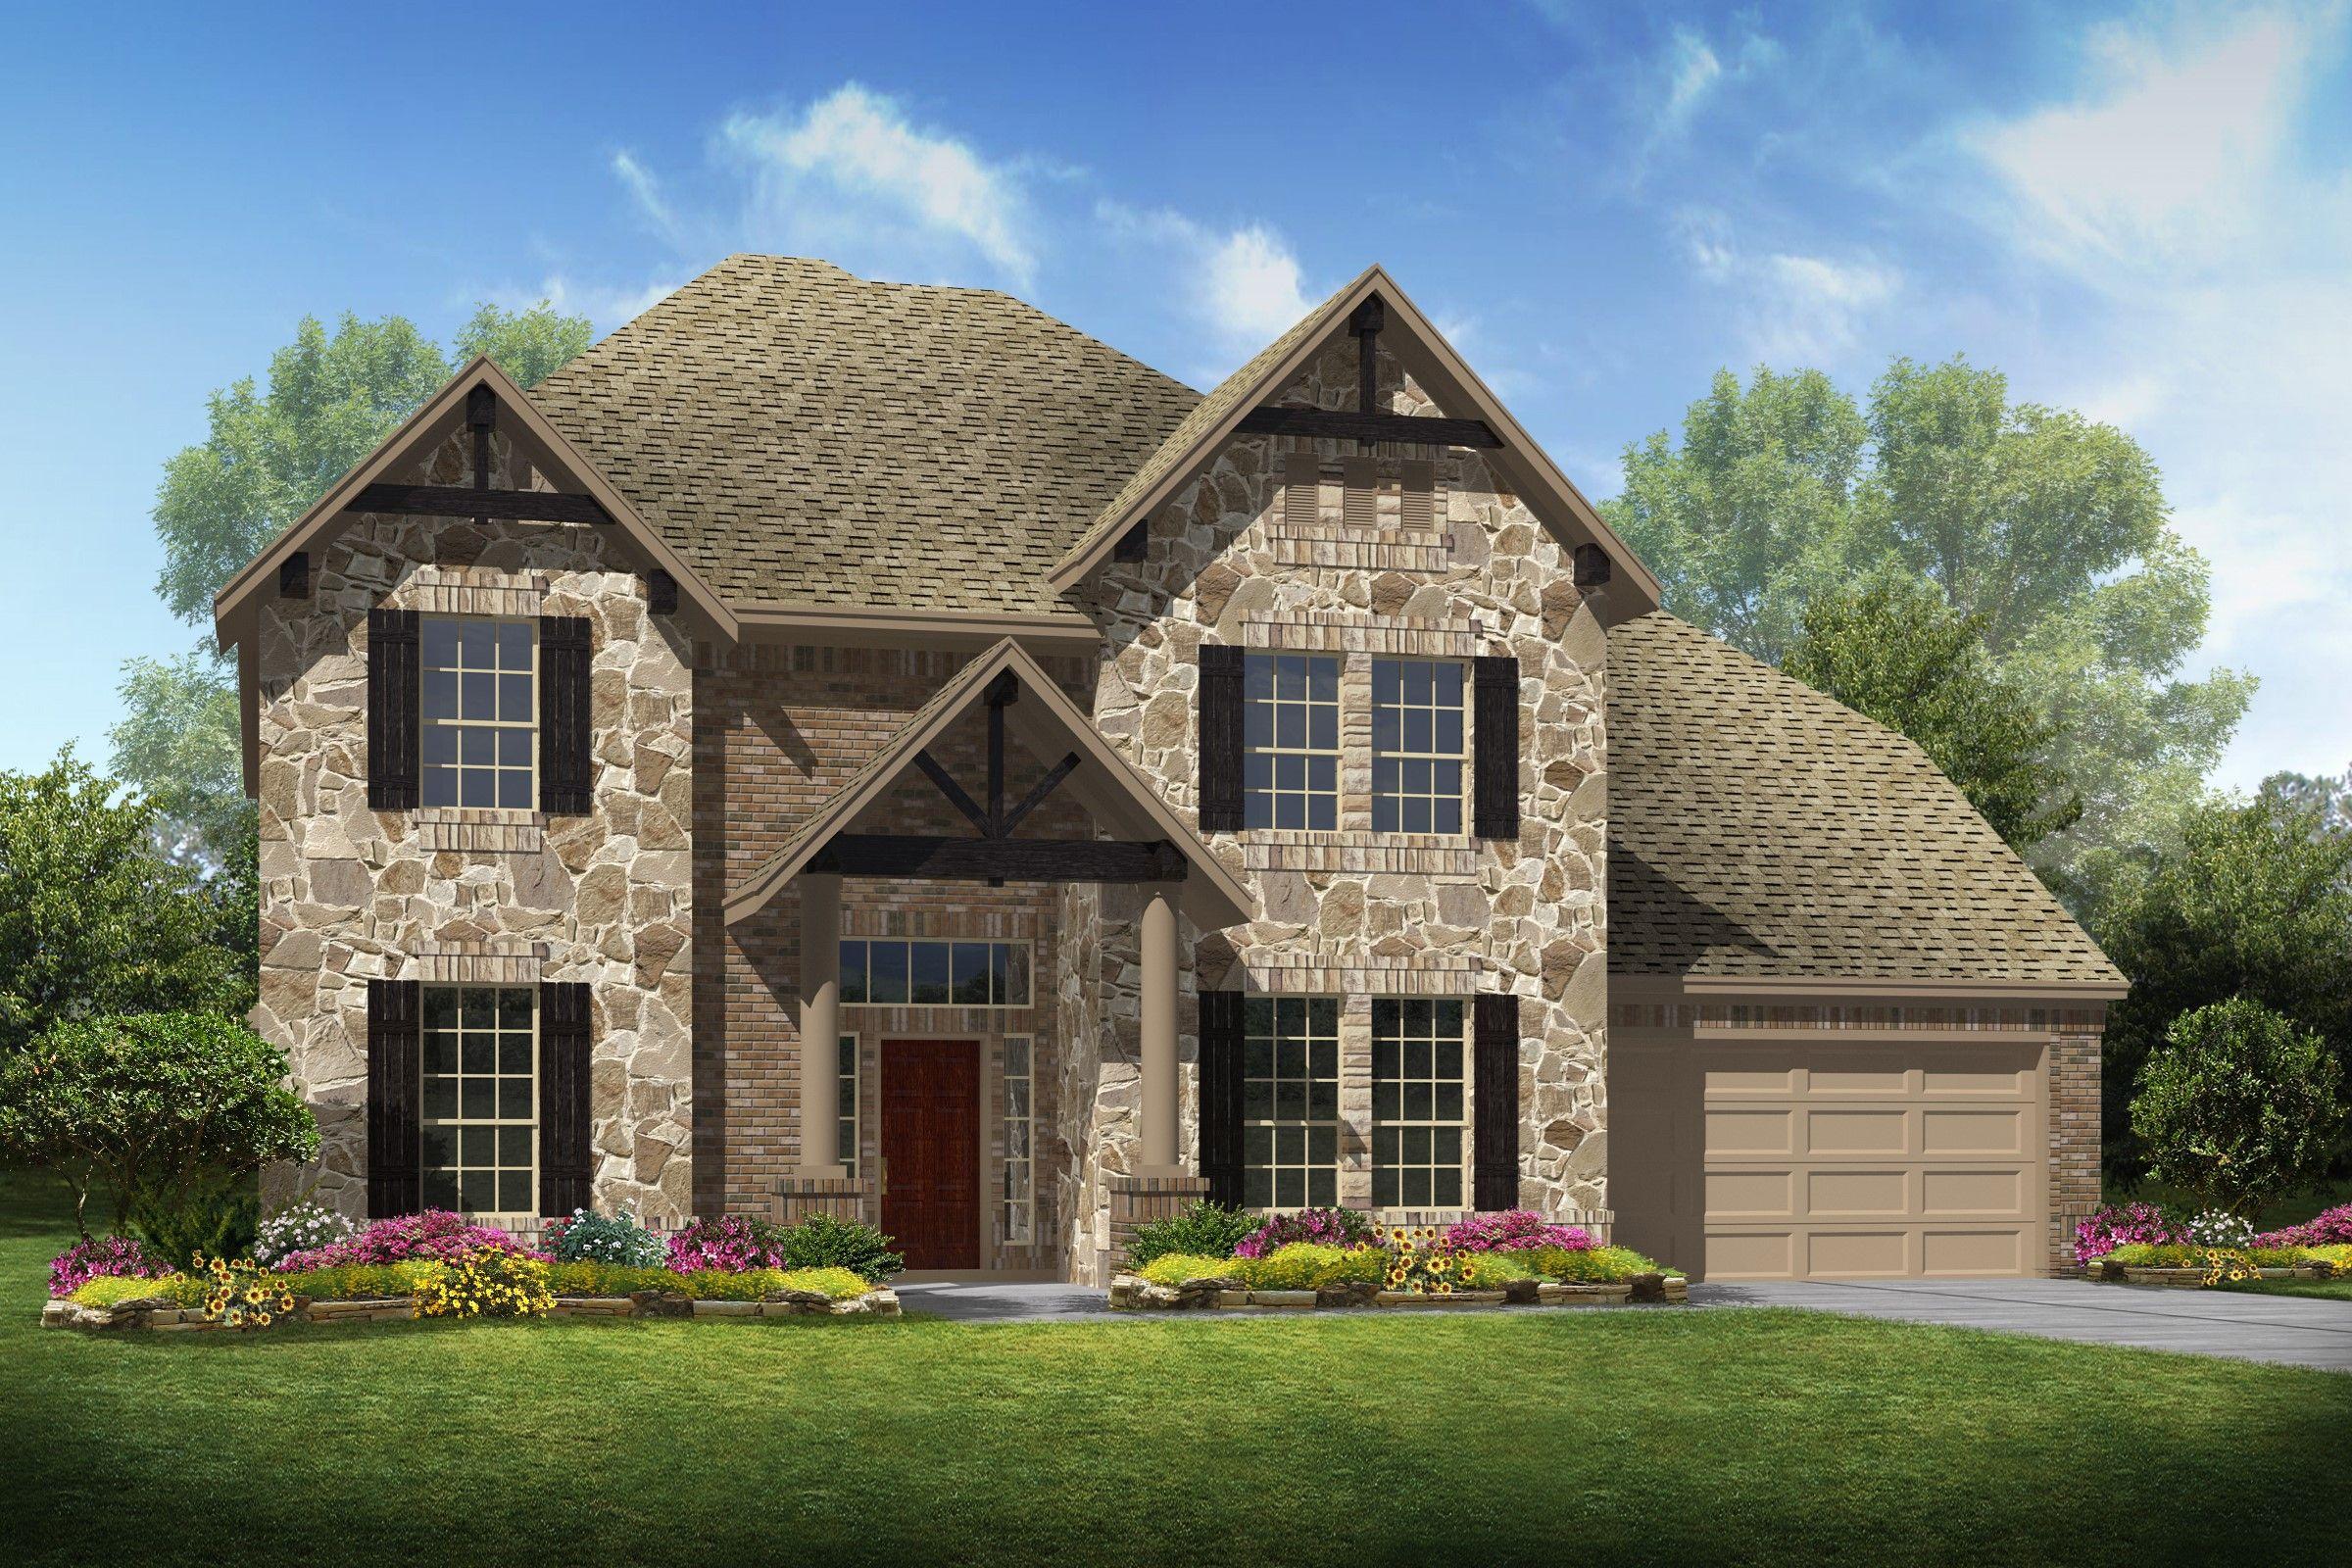 Single Family for Sale at Lane 2102 Opal Field Lane Rosenberg, Texas 77469 United States